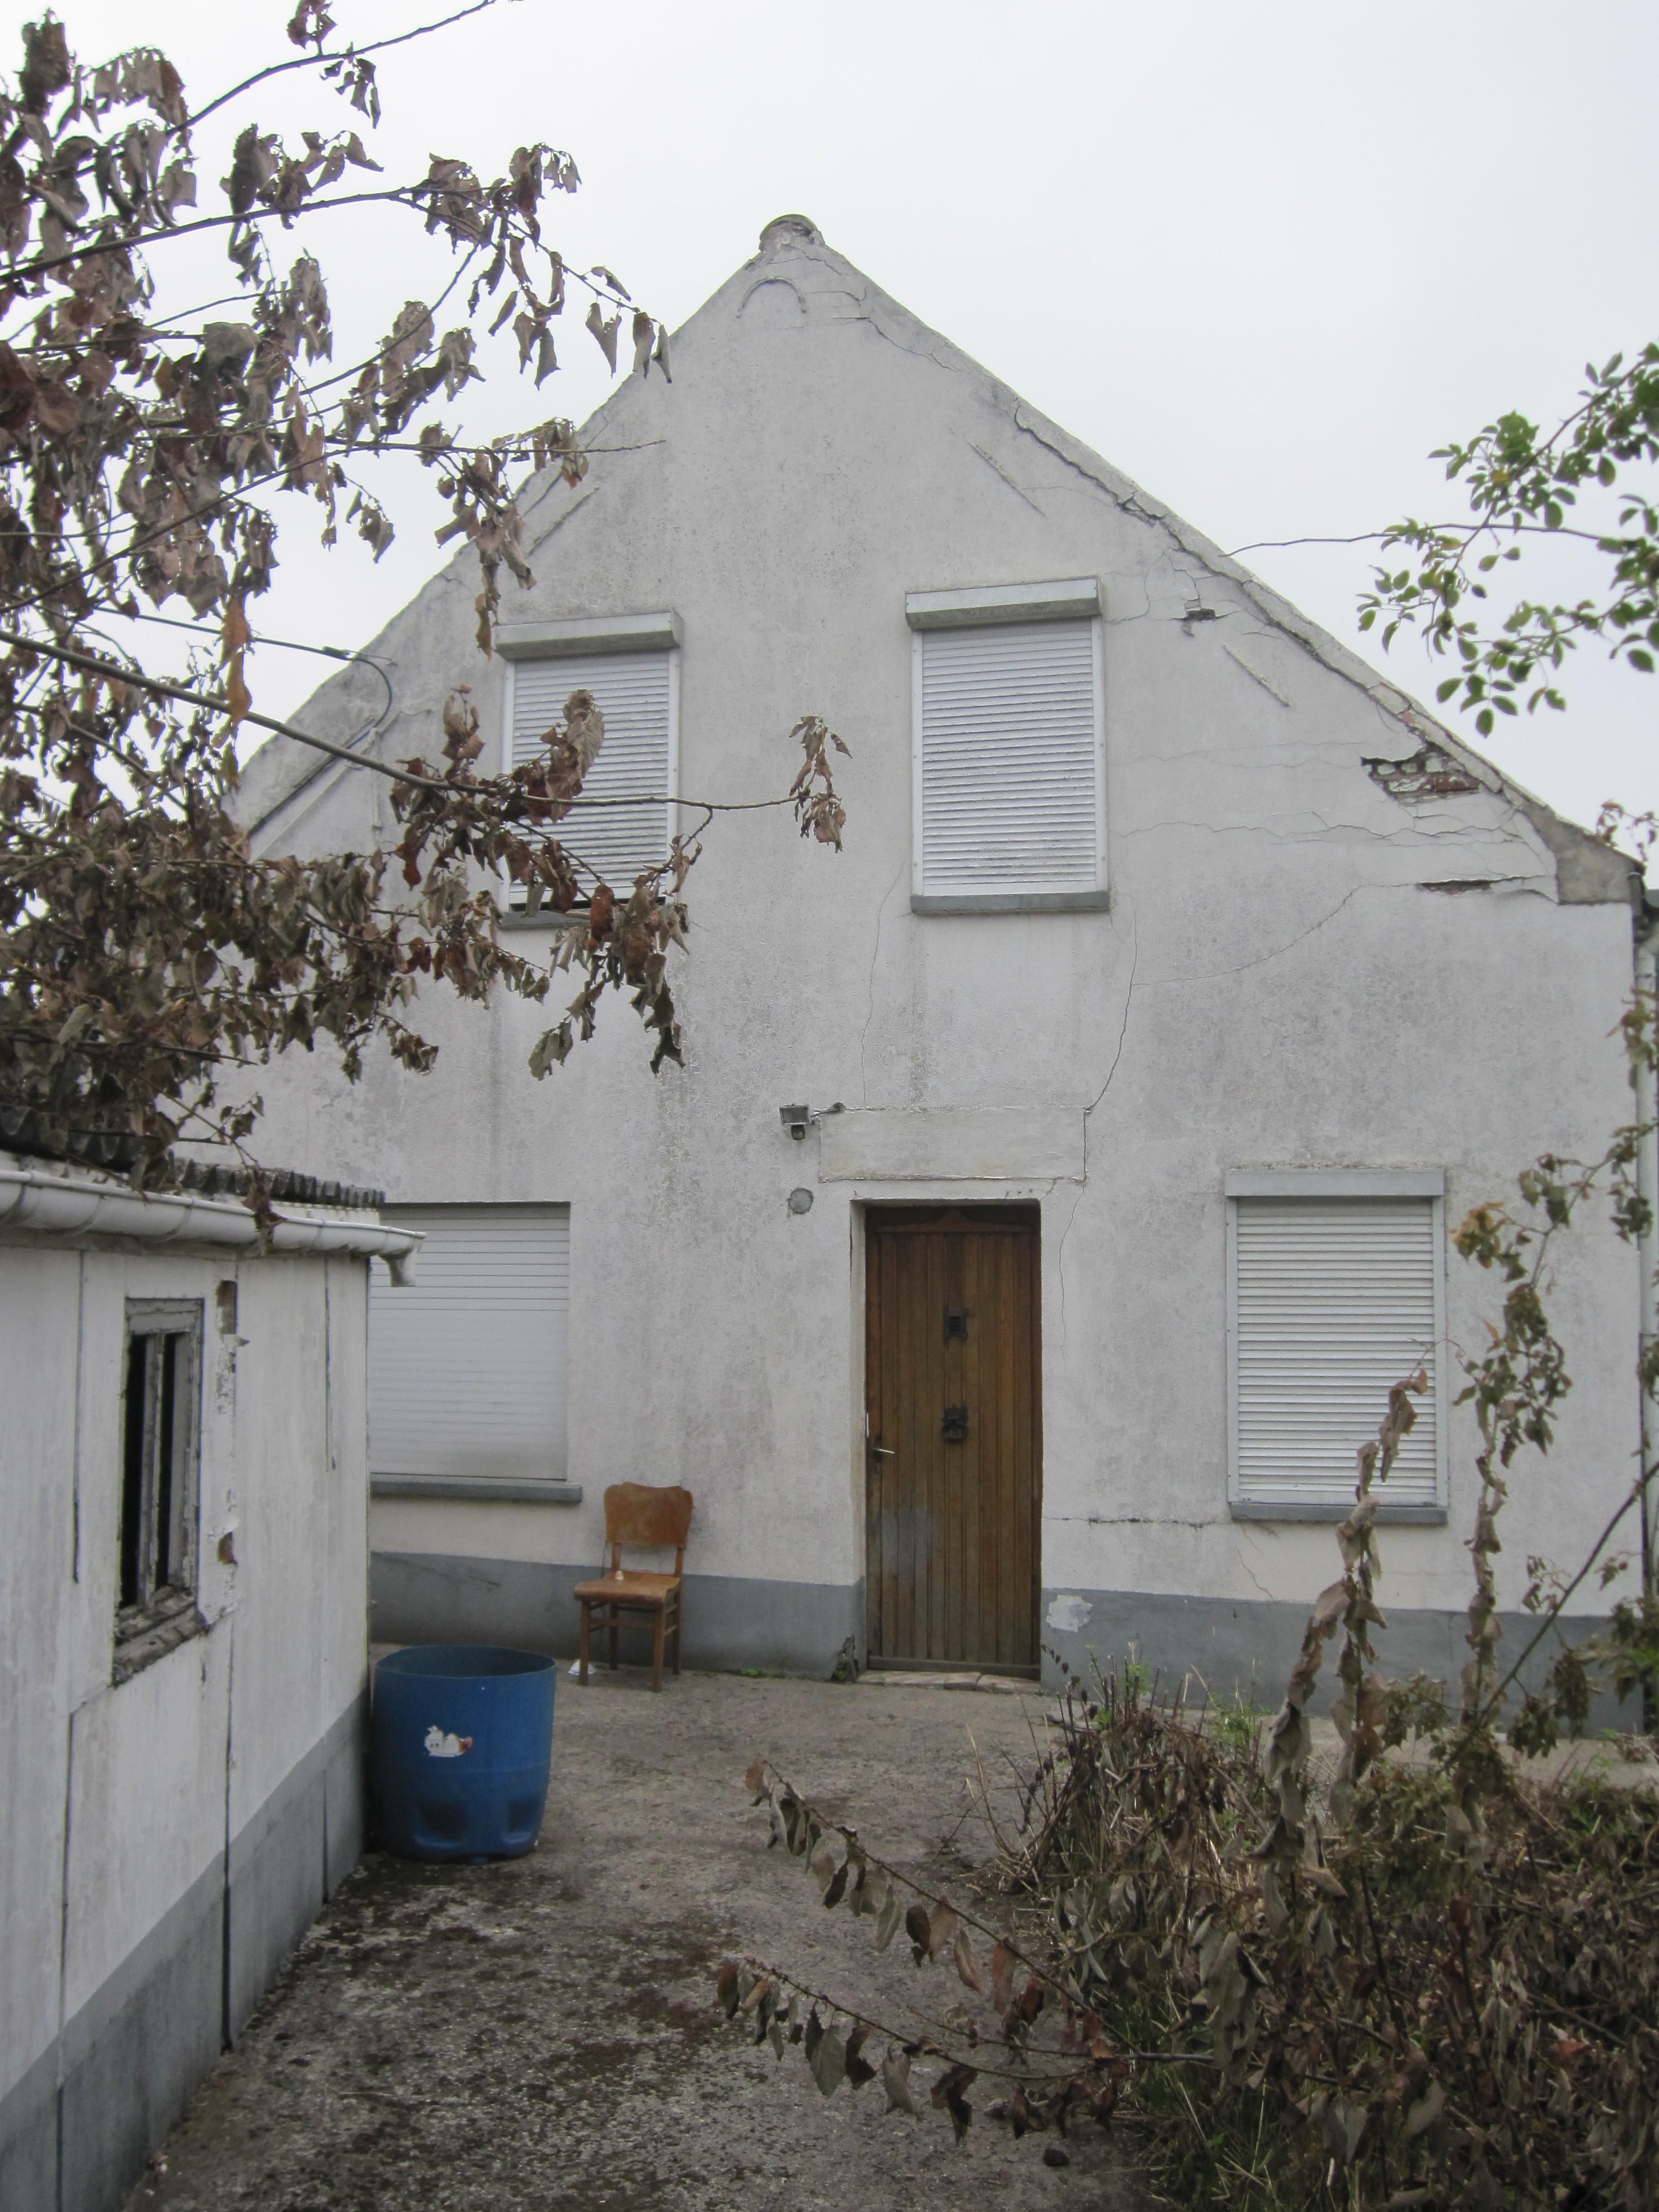 vente 1 maison d 39 habitation r nover nvn